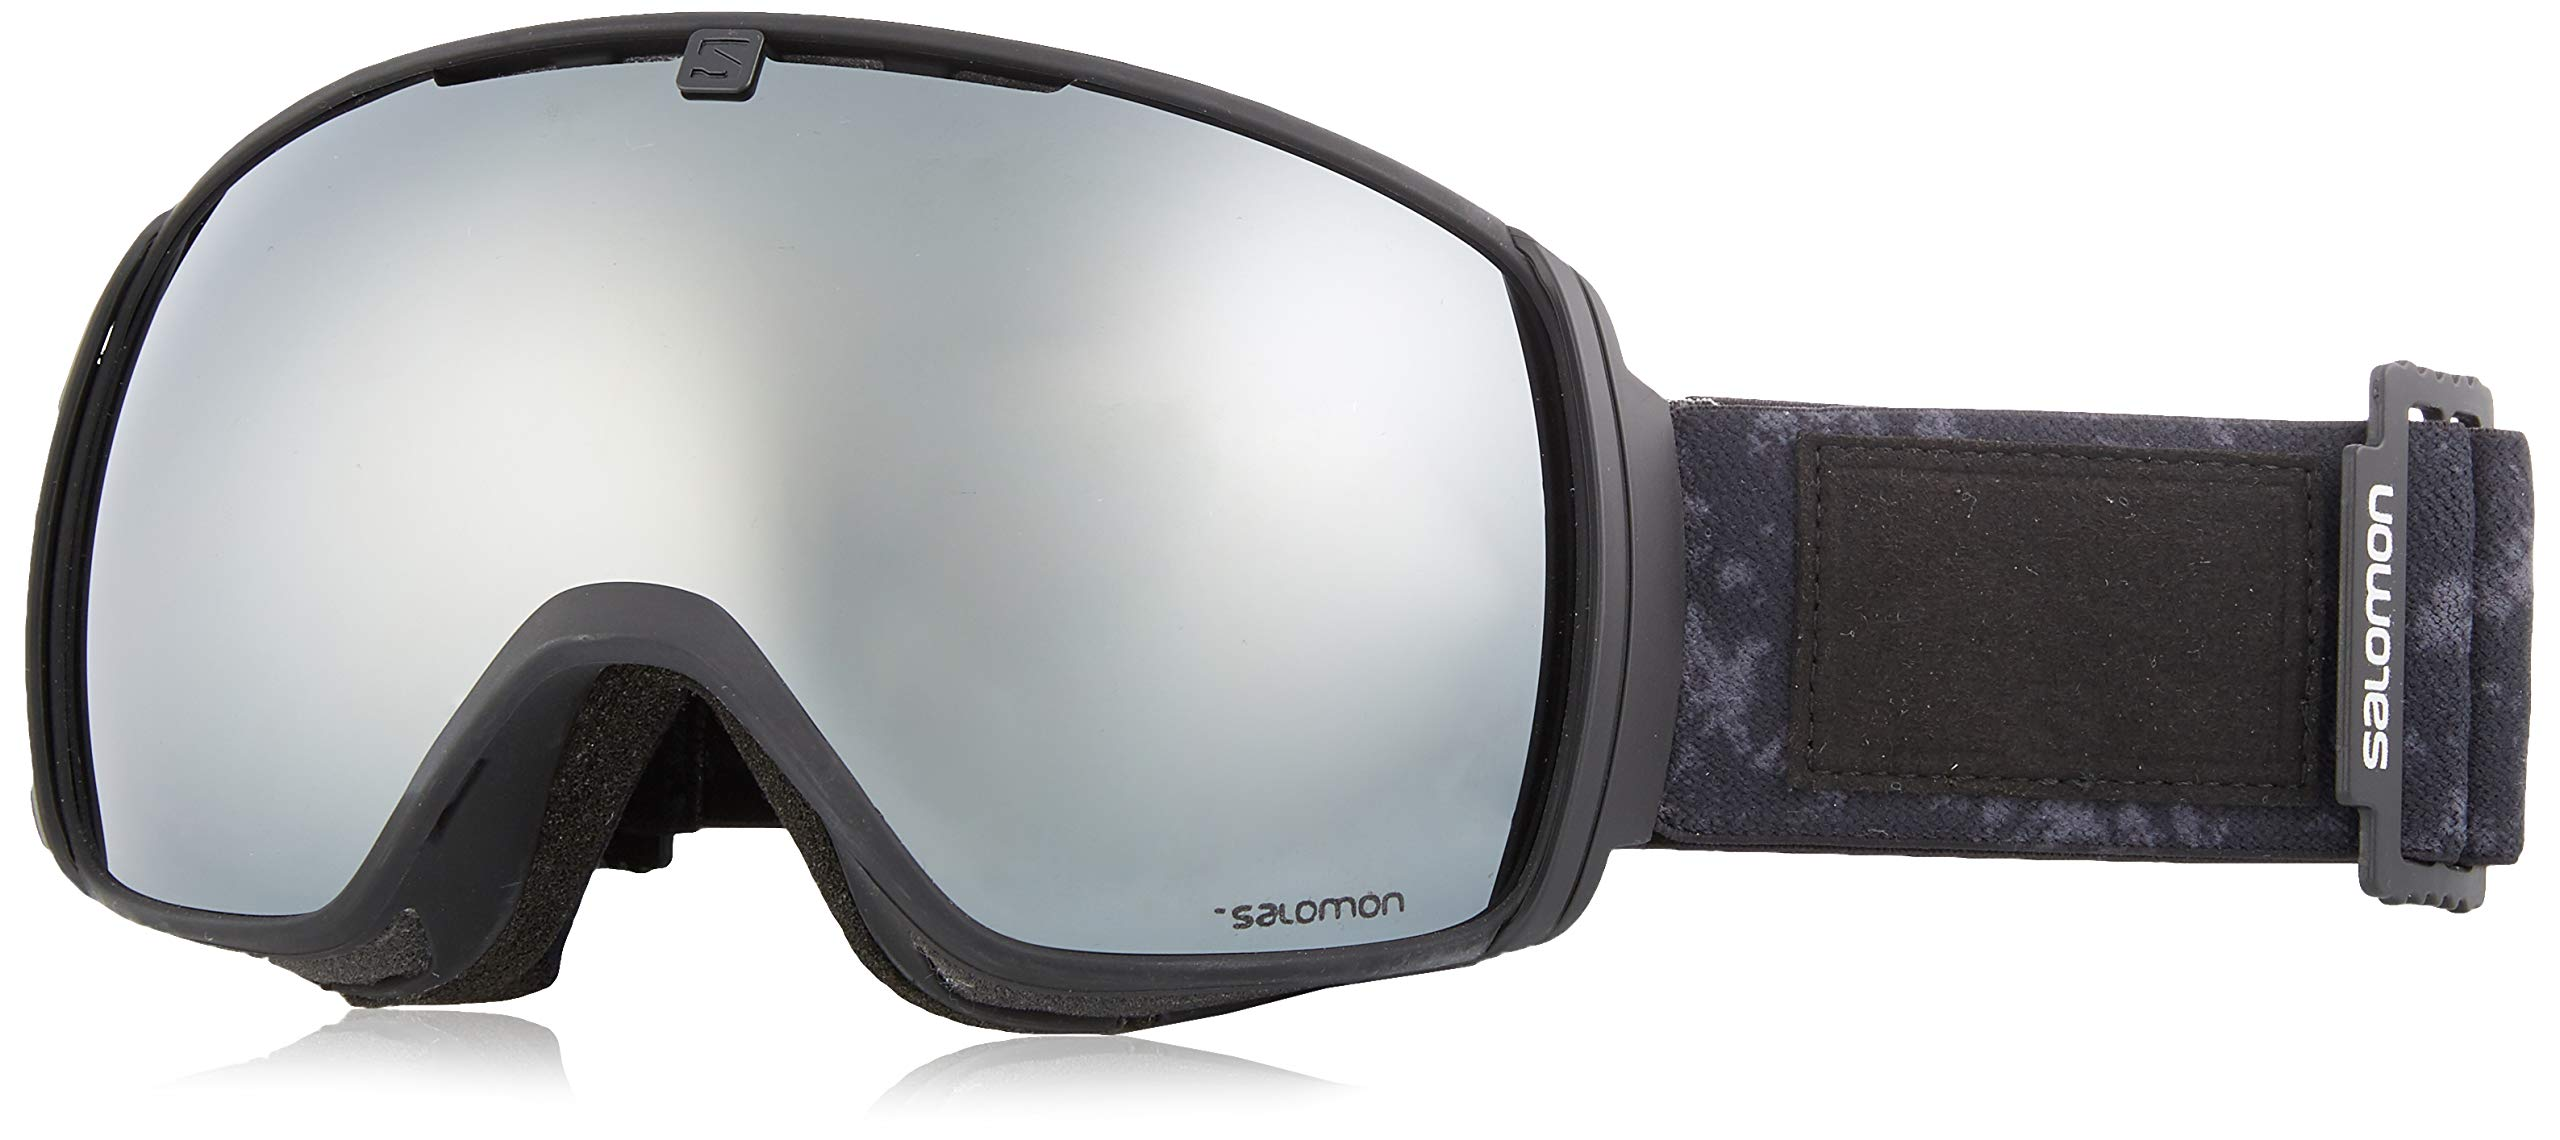 Salomon ski Goggles One Black Tie